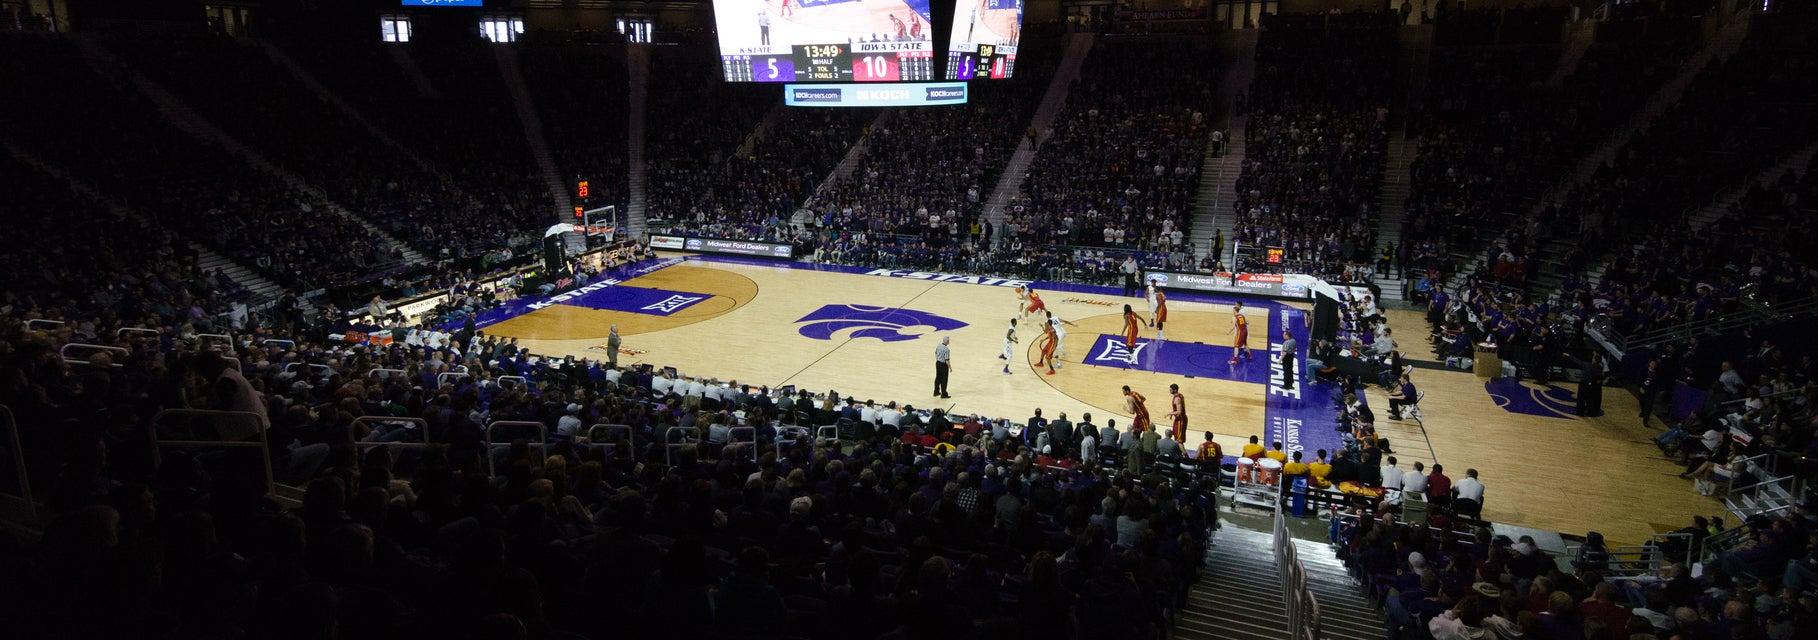 Kansas State Basketball Tickets